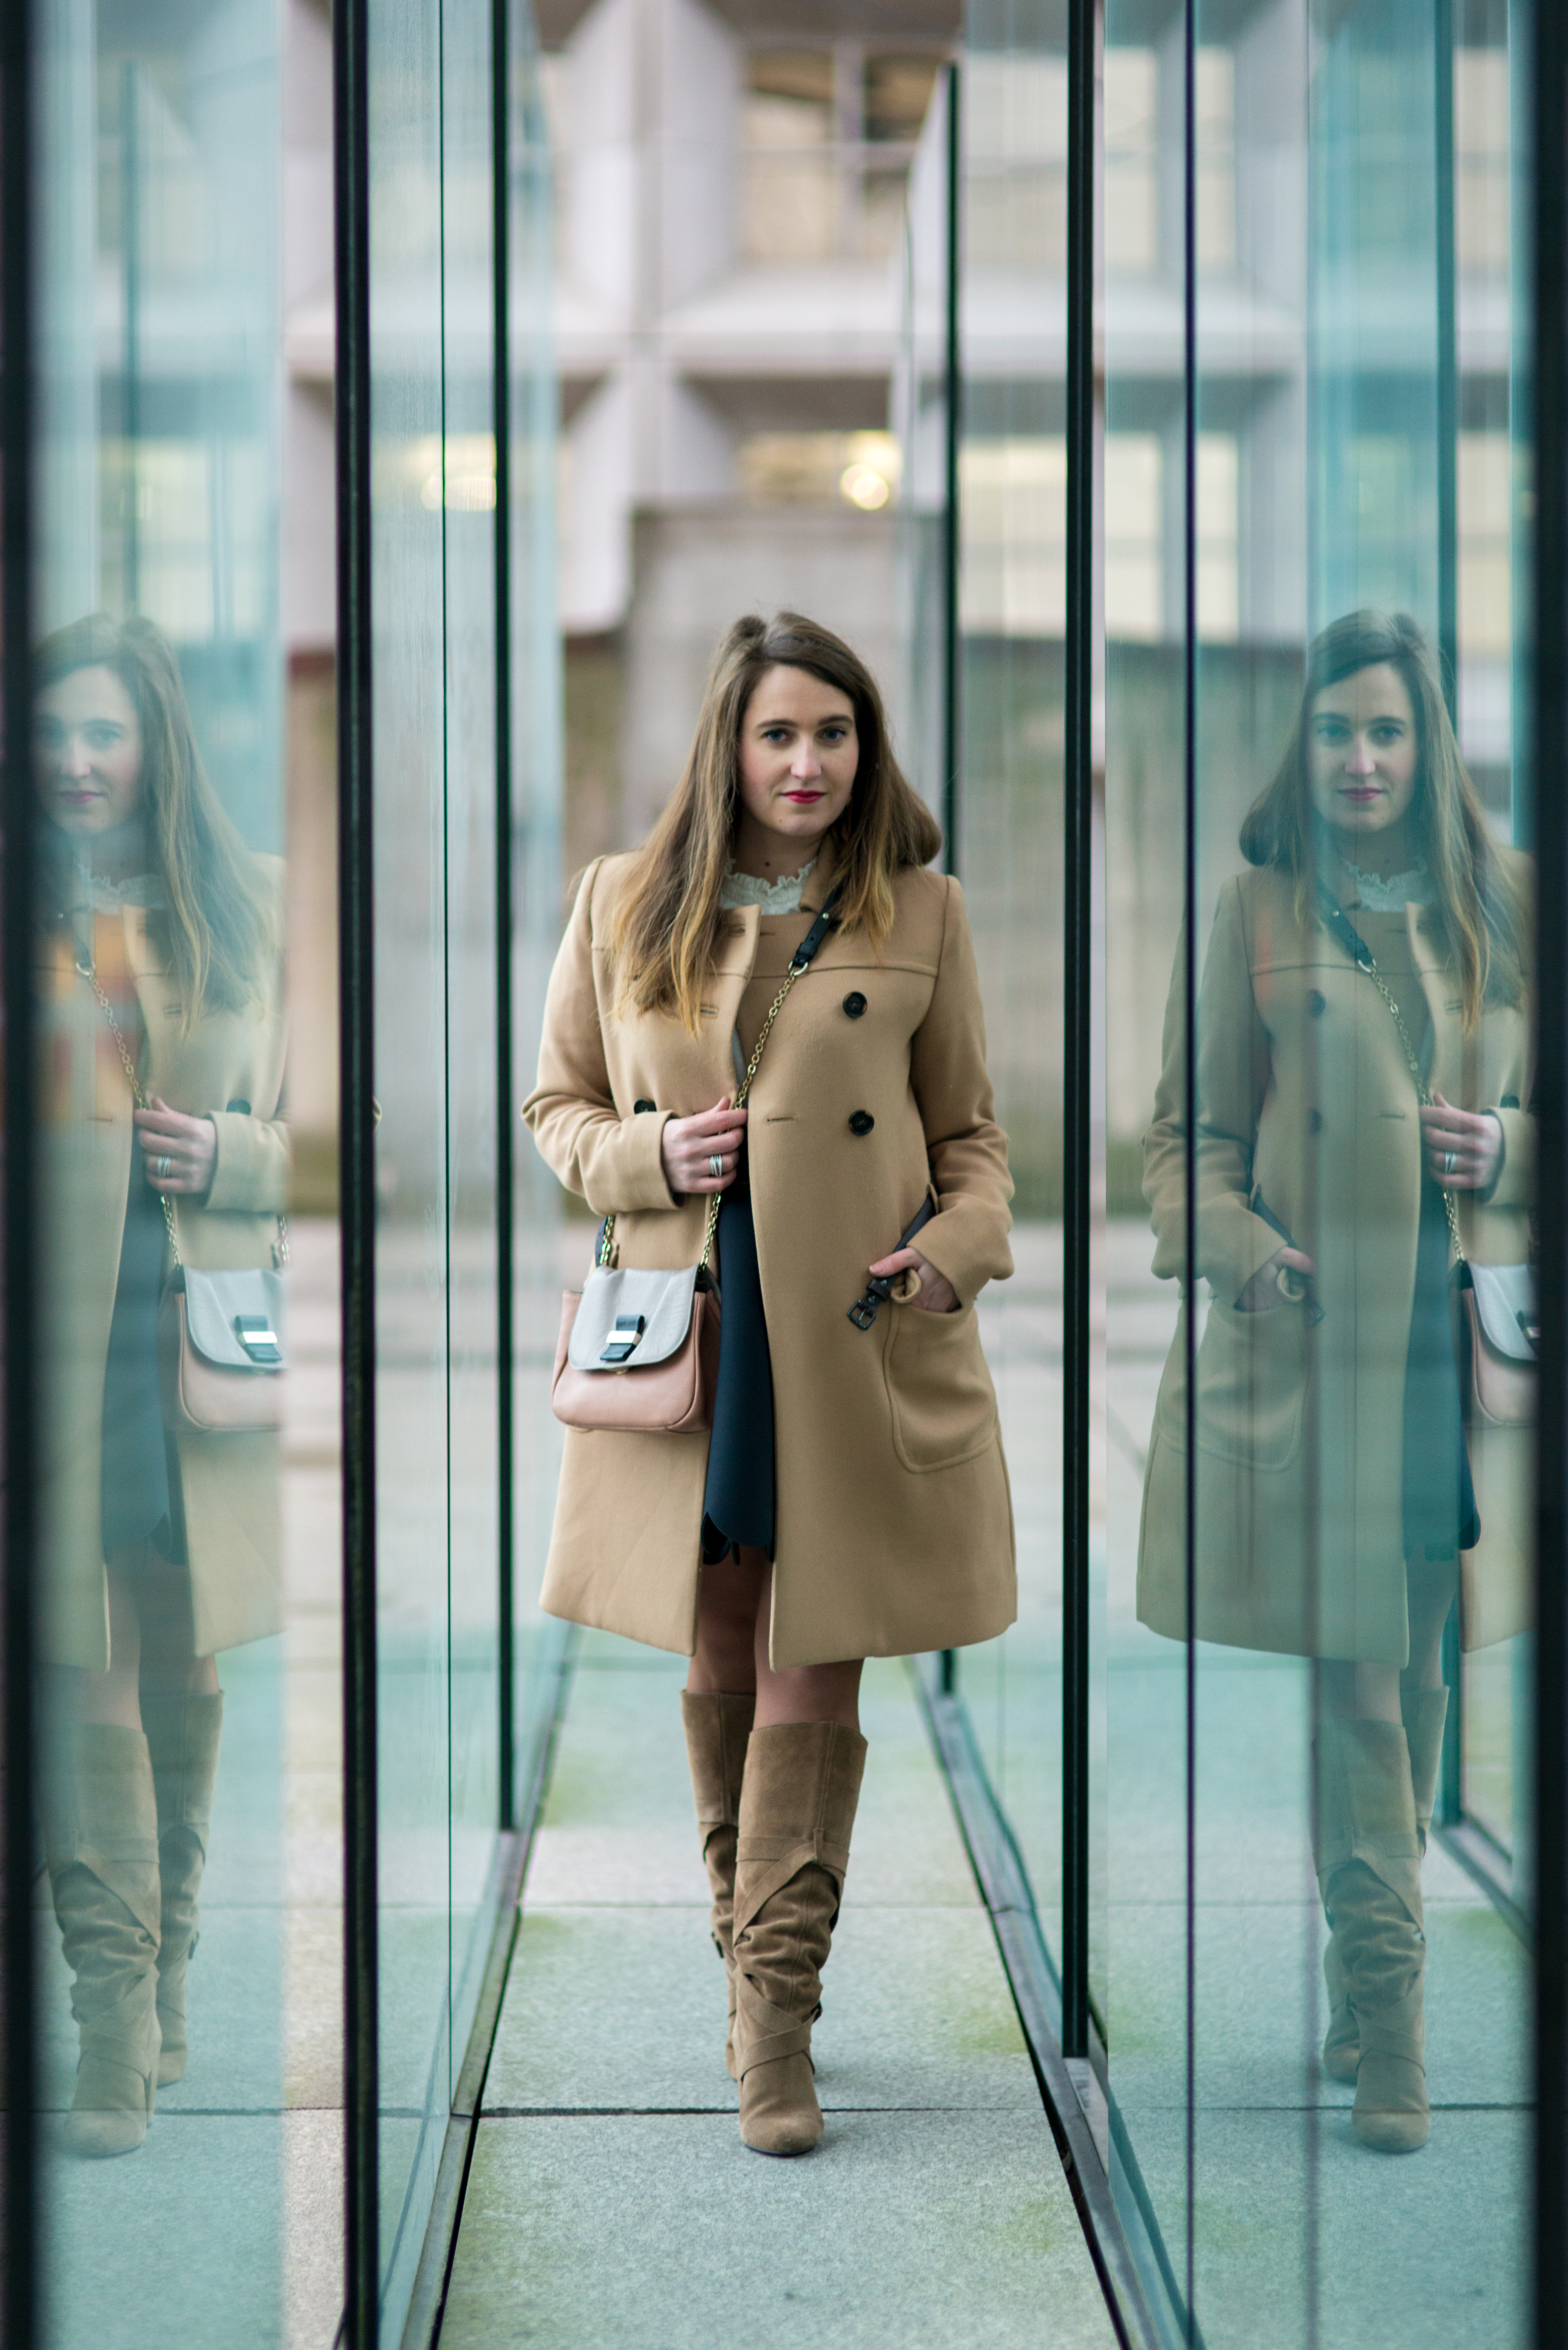 style-sophistique-modele-grandearche-ladefense-paris-fashionblogger-influencer-blouse-zara-seralynepointcom-ump_6641